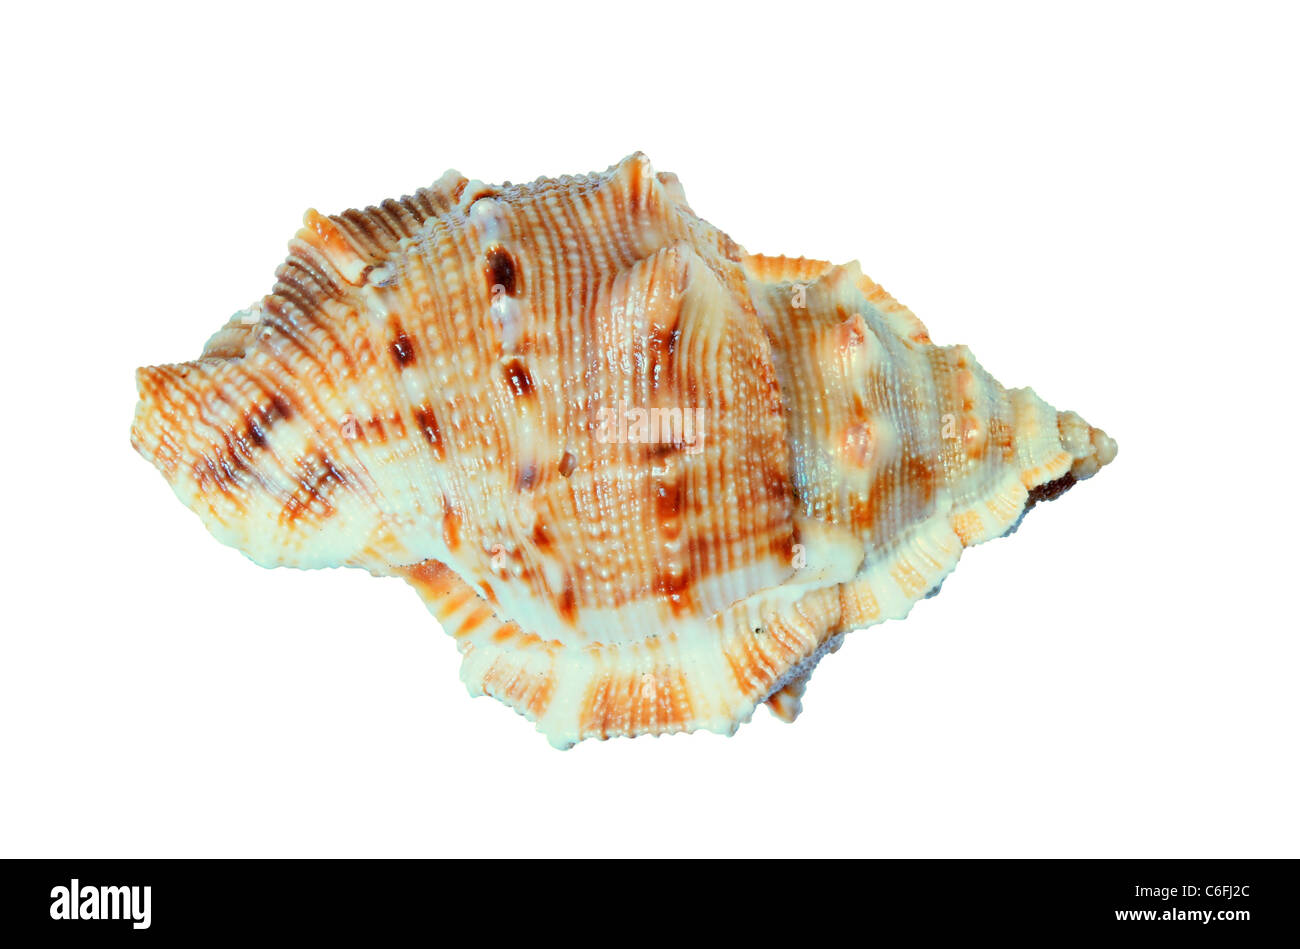 Pequeño caracol múrice aislado sobre fondo blanco. Imagen De Stock